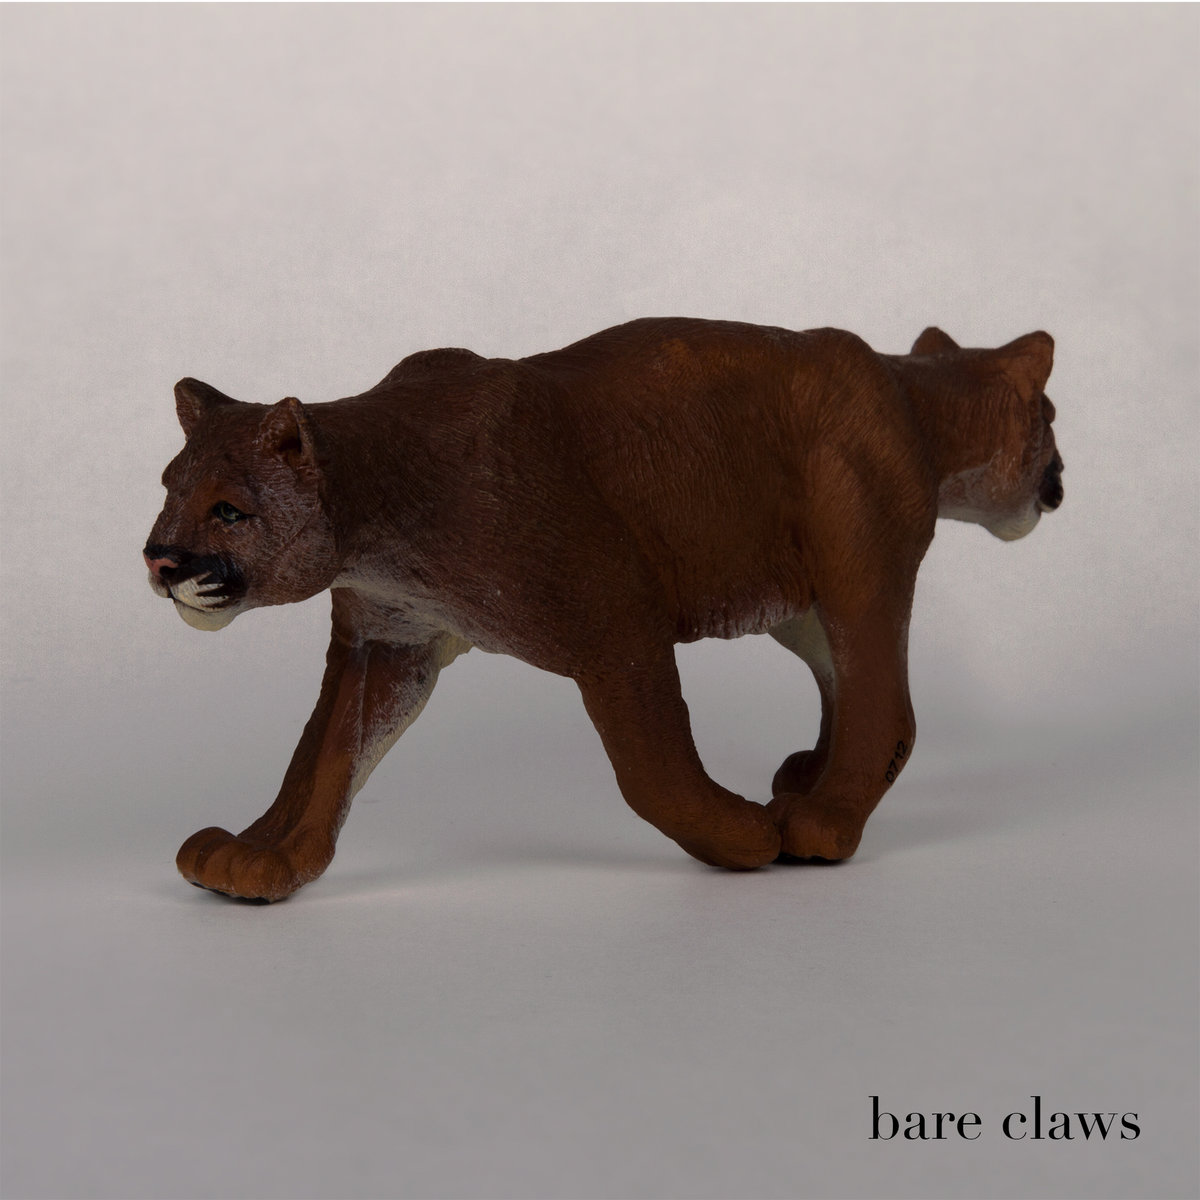 BARE CLAWS